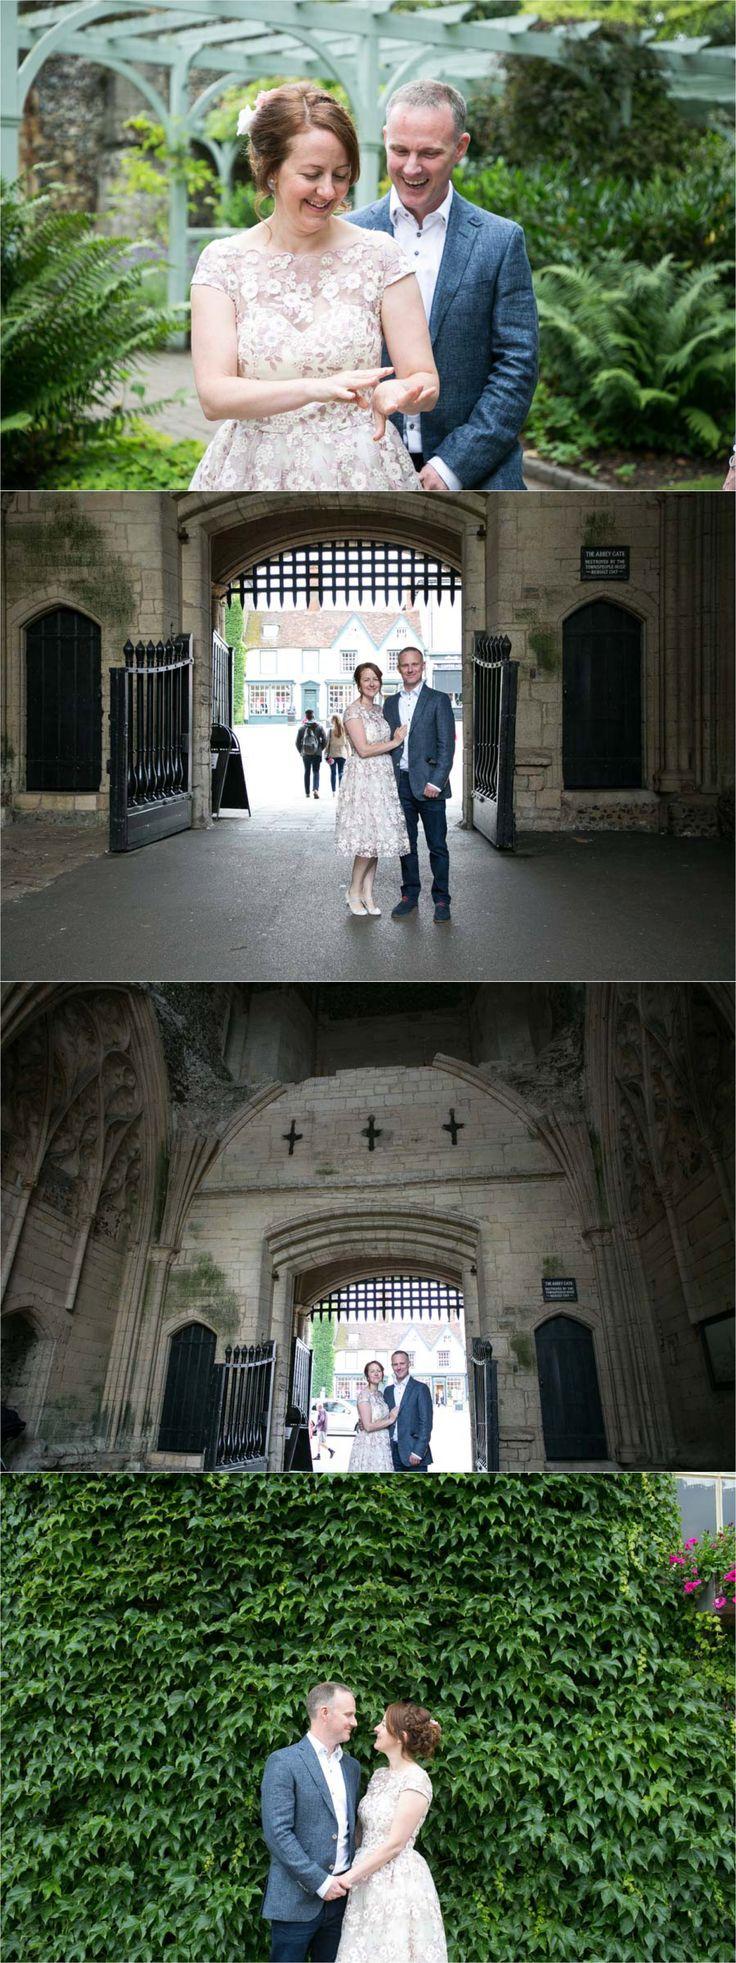 bury st edmunds wedding photography, suffolk